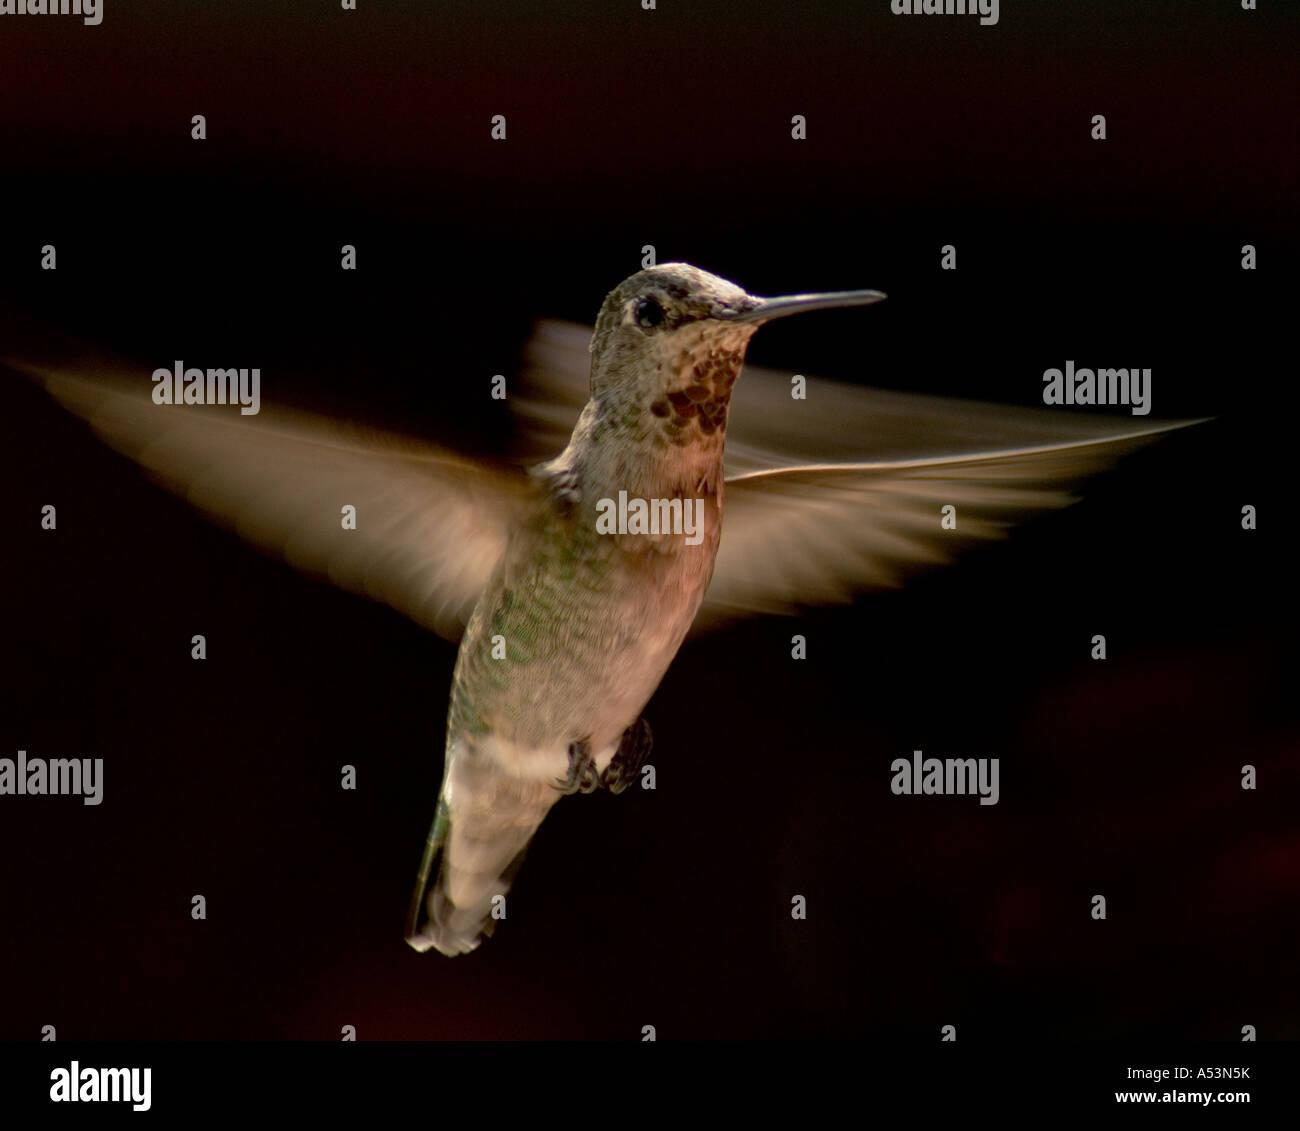 Anna's Humming Bird Photo Stock